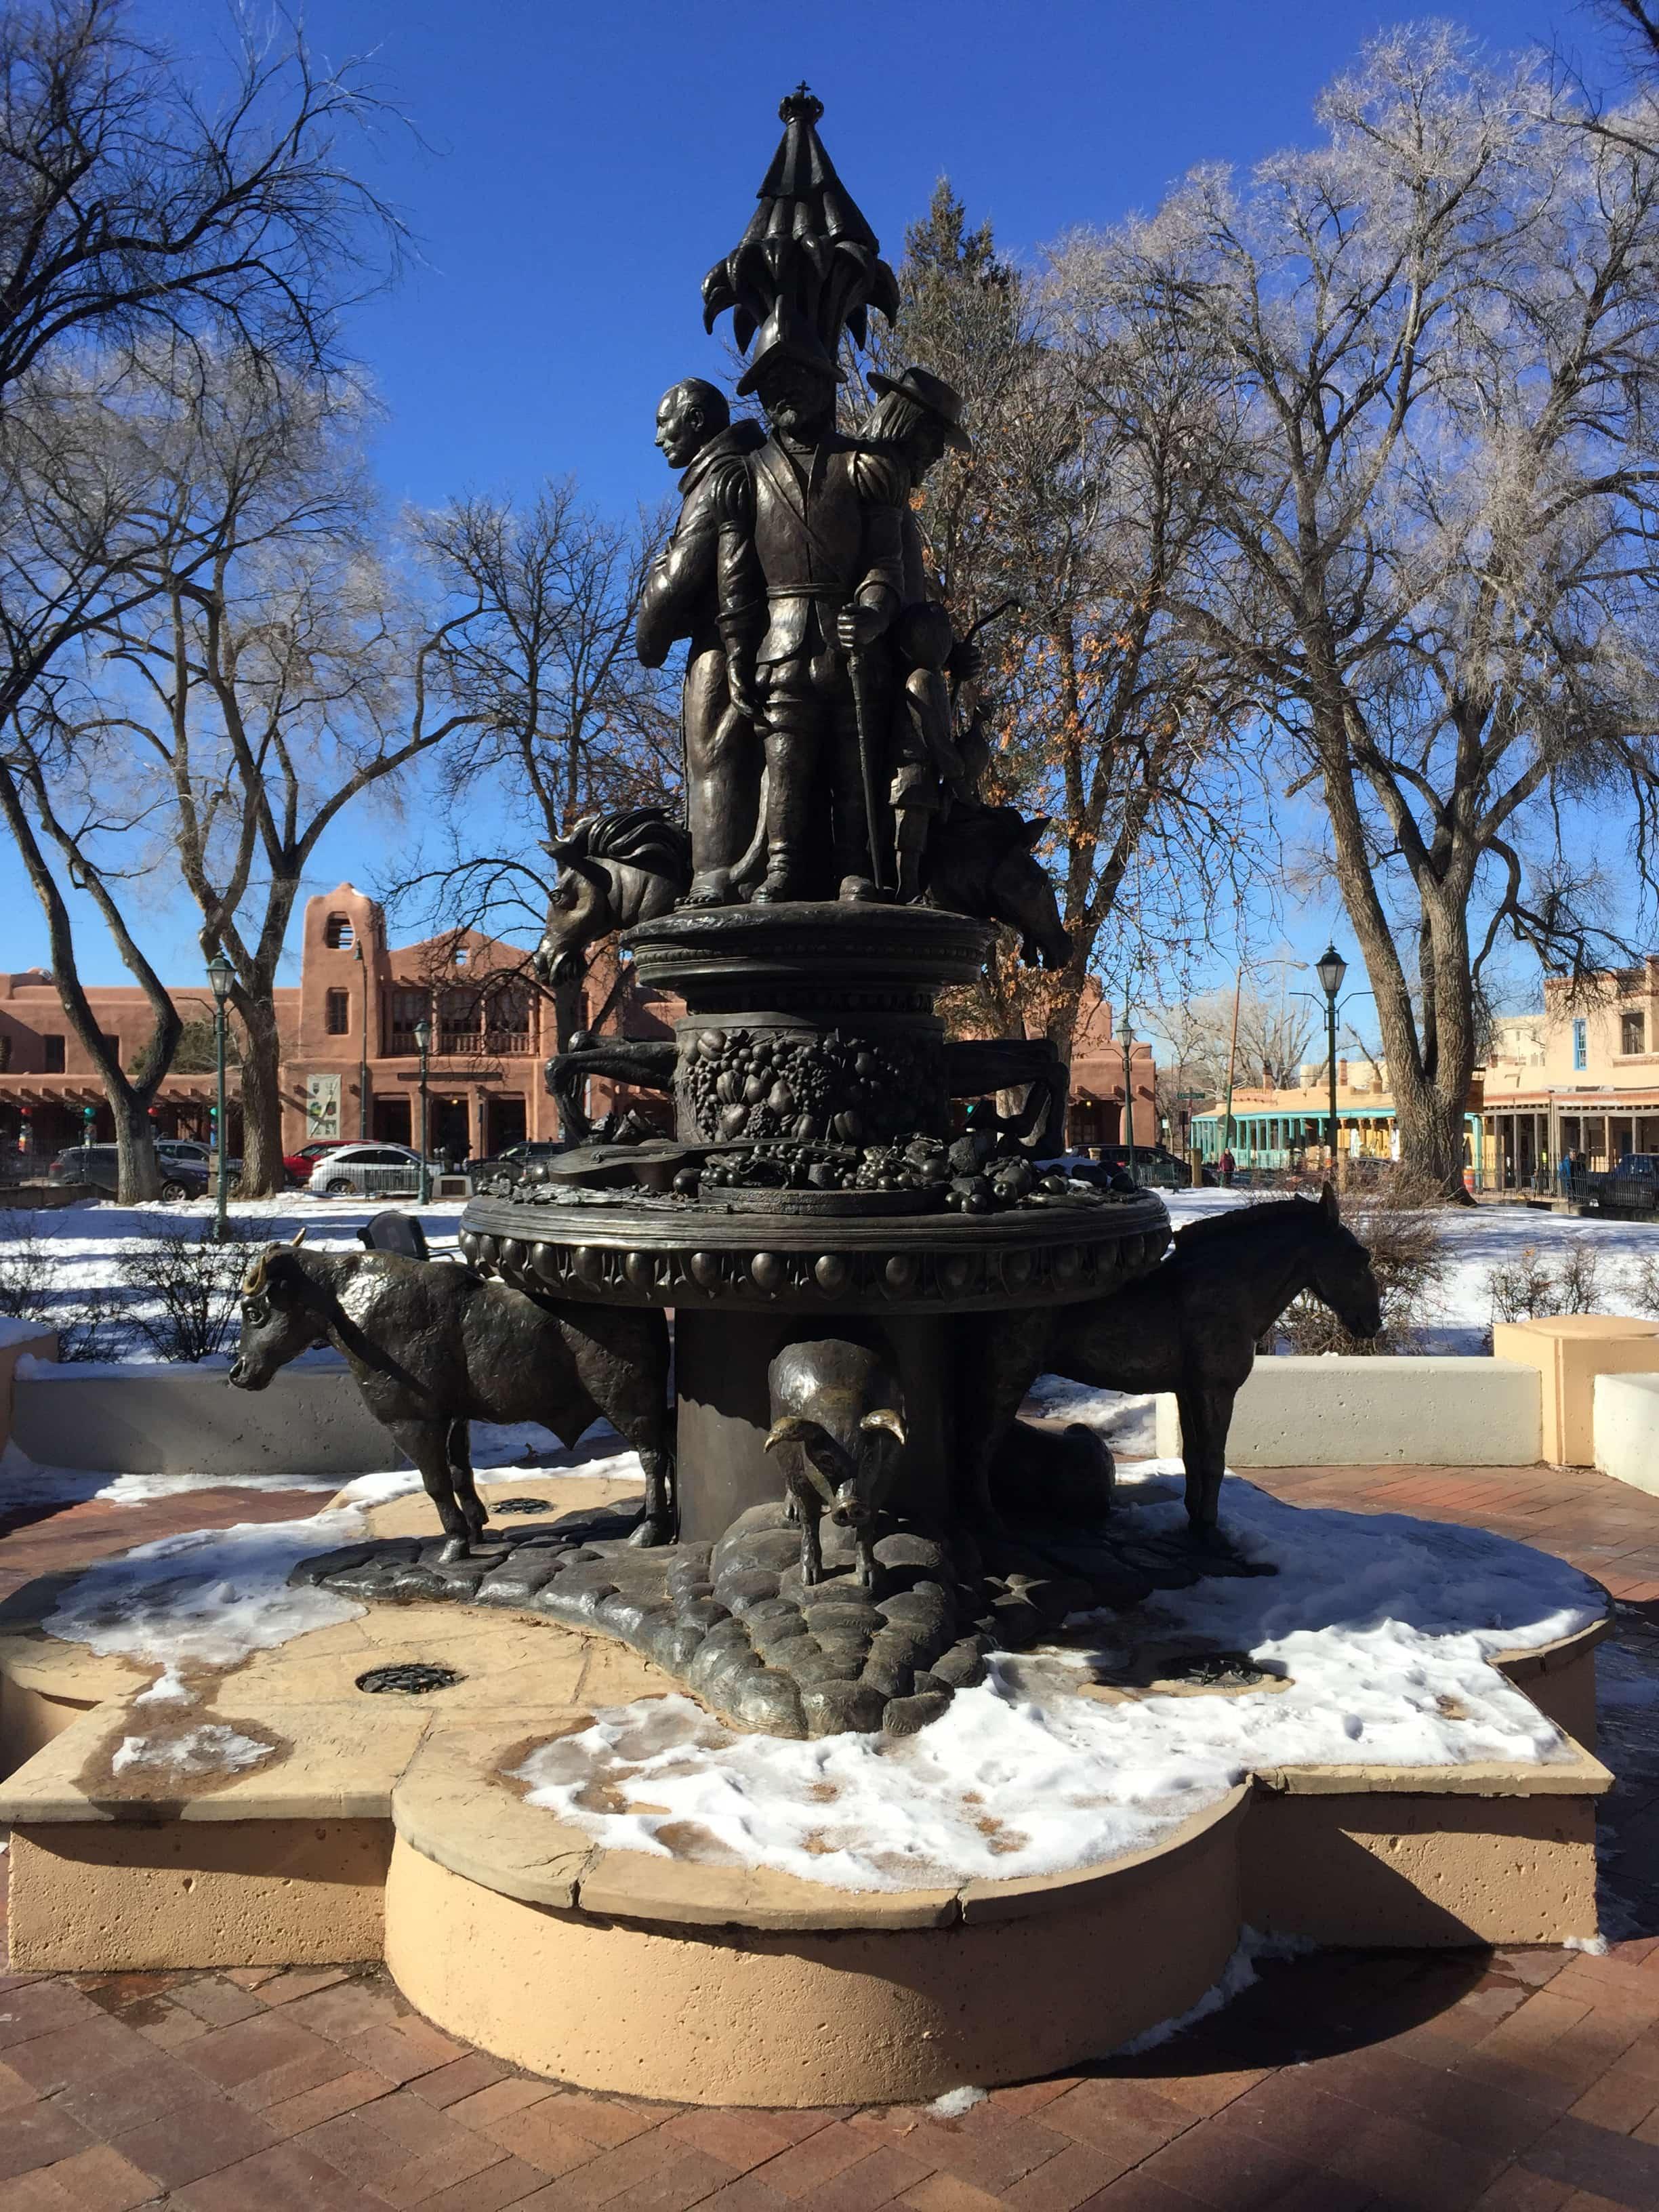 Historic fountain in Santa Fe new Mexico.